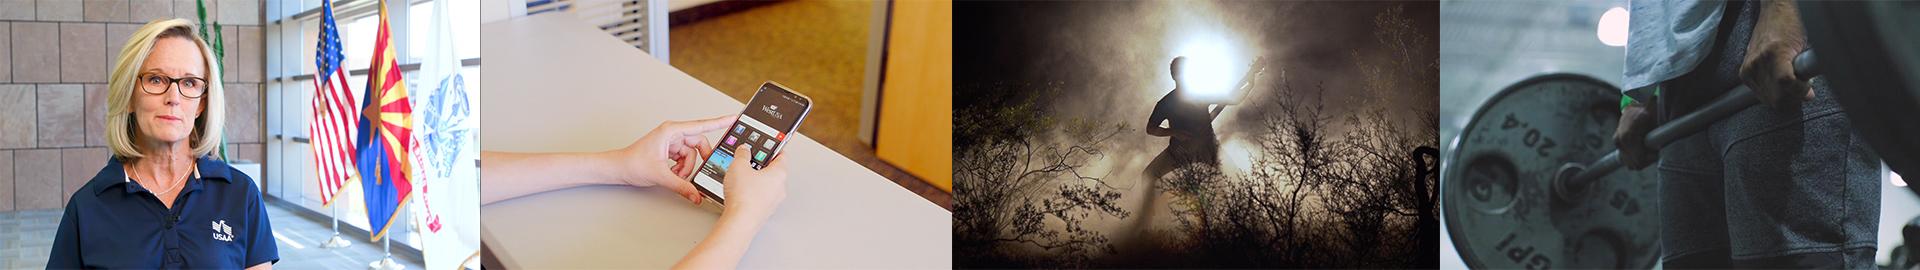 Artboard 2 CINEMATOGRAPHY.jpg